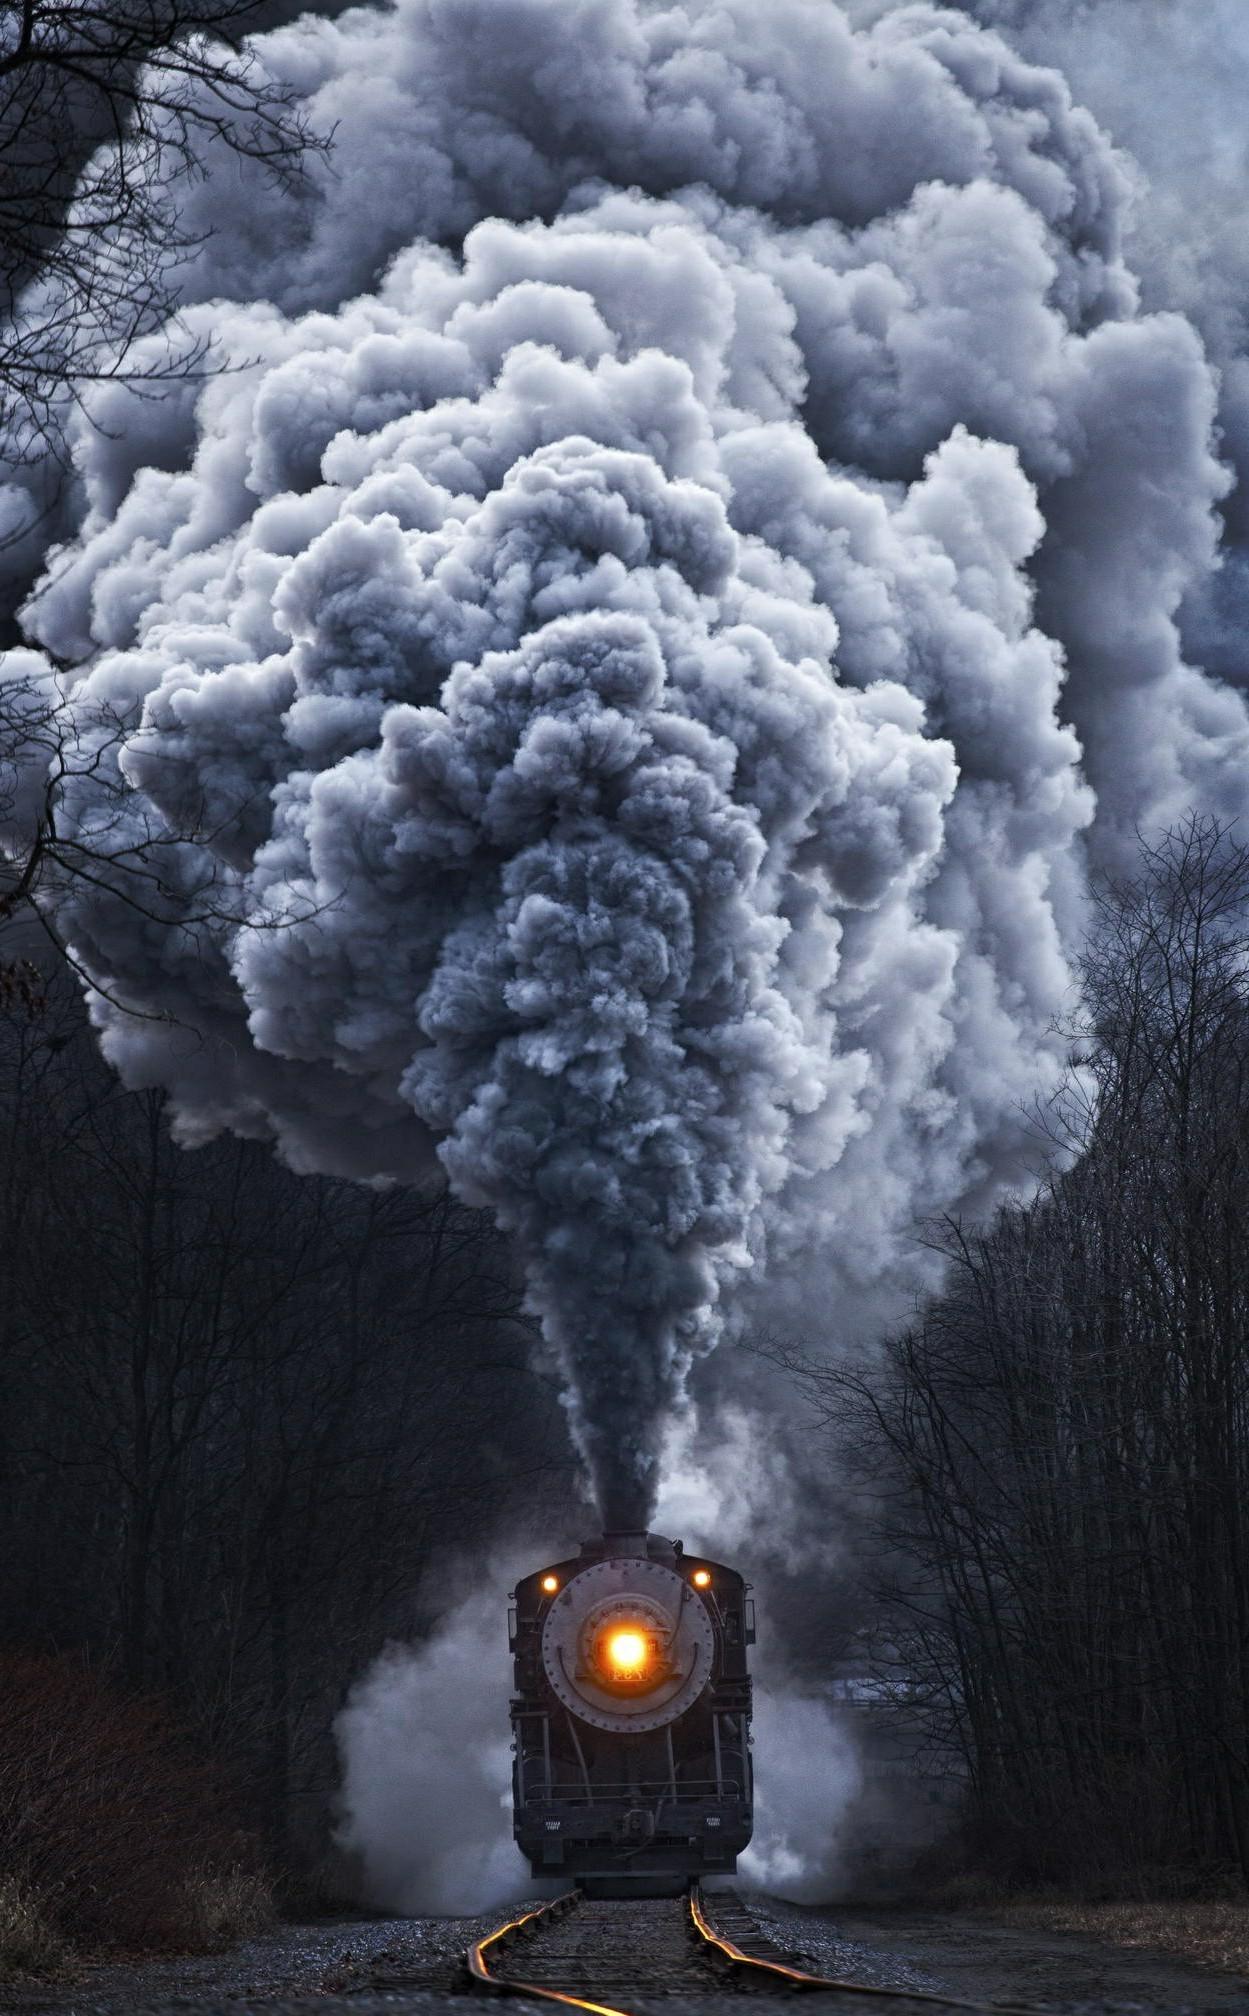 wallpaper : nature, portrait display, snow, train, asphalt, soil